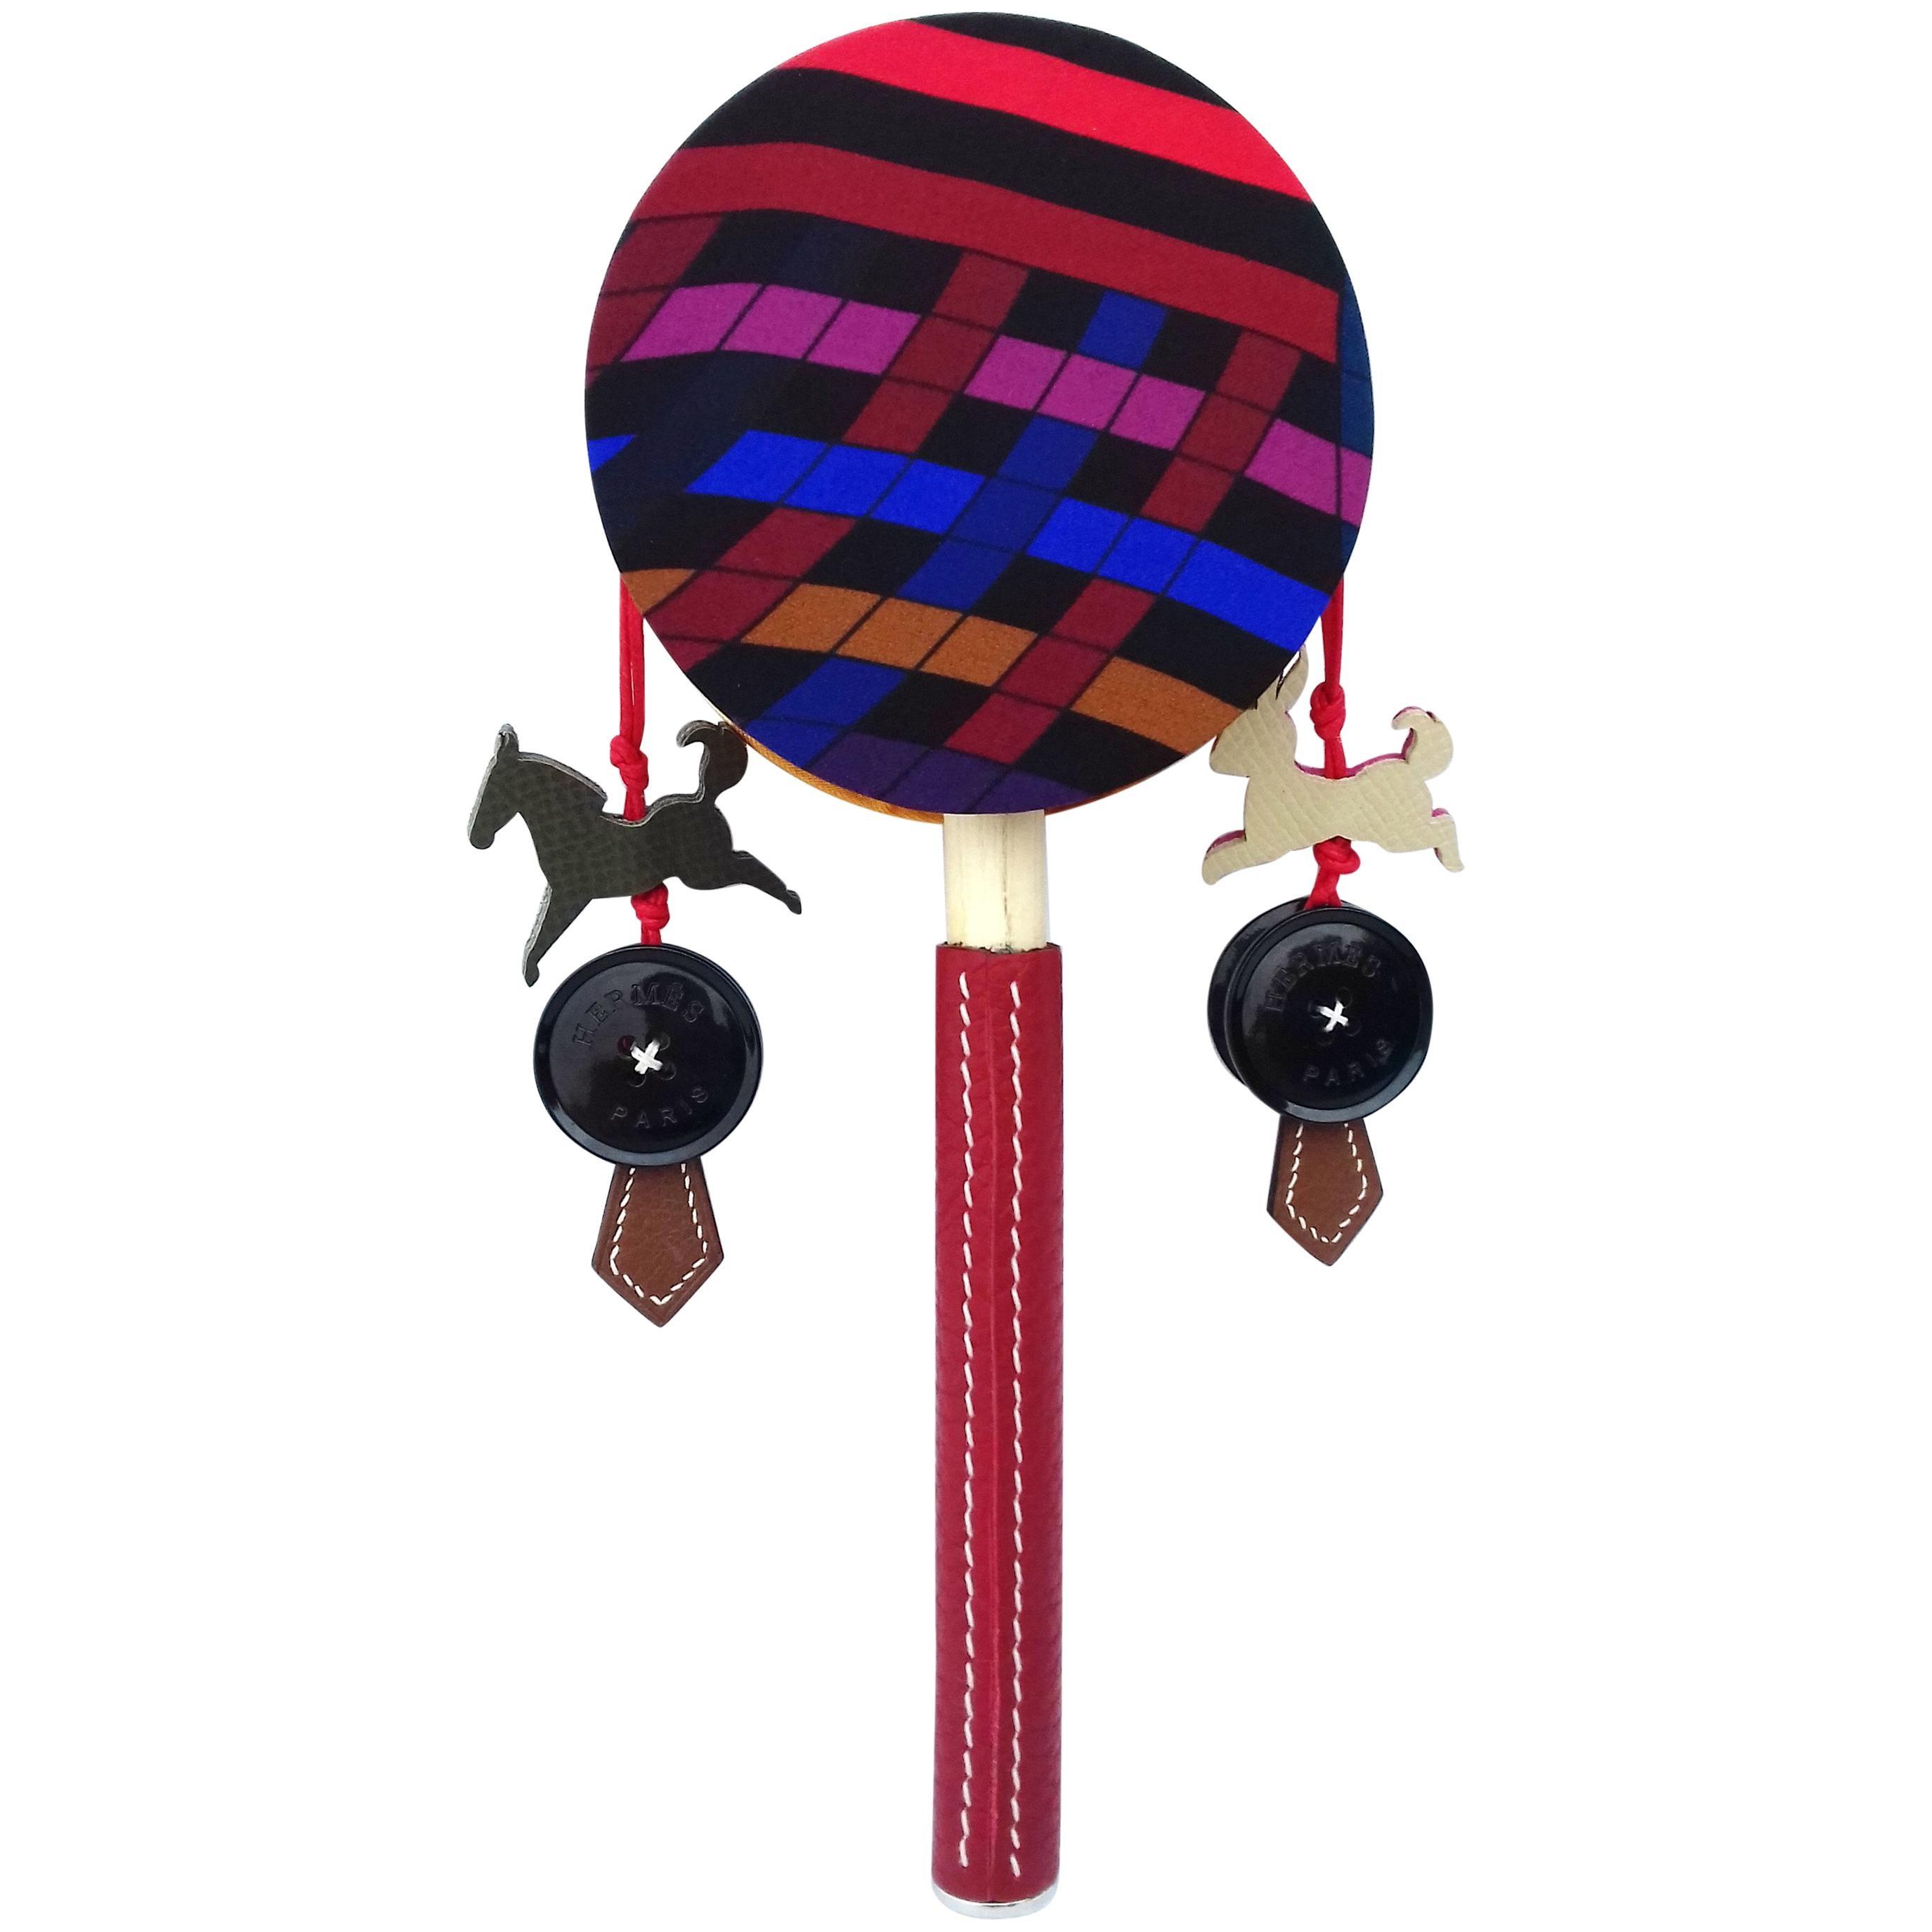 Hermès Petit H Tambourine Rattle Toy Silk Leather Wood in Box